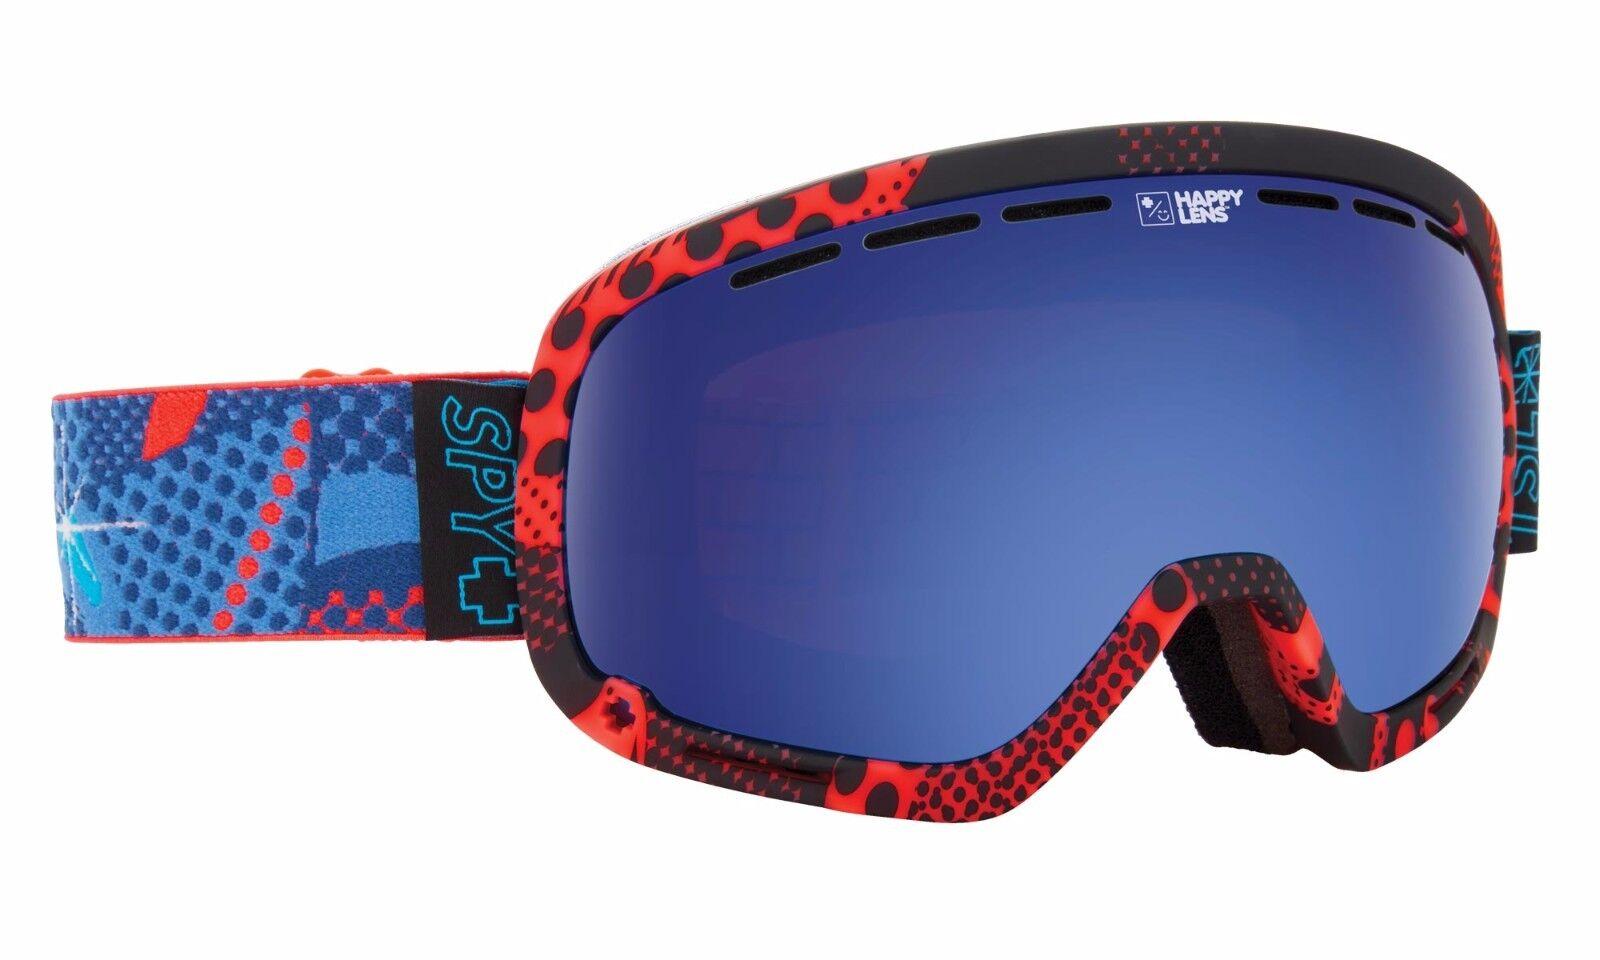 NEW  Spy Optic MARSHALL TSL VIZIE Snowboard Ski Goggle HAPPY pink DARK blueE LENS  unique shape